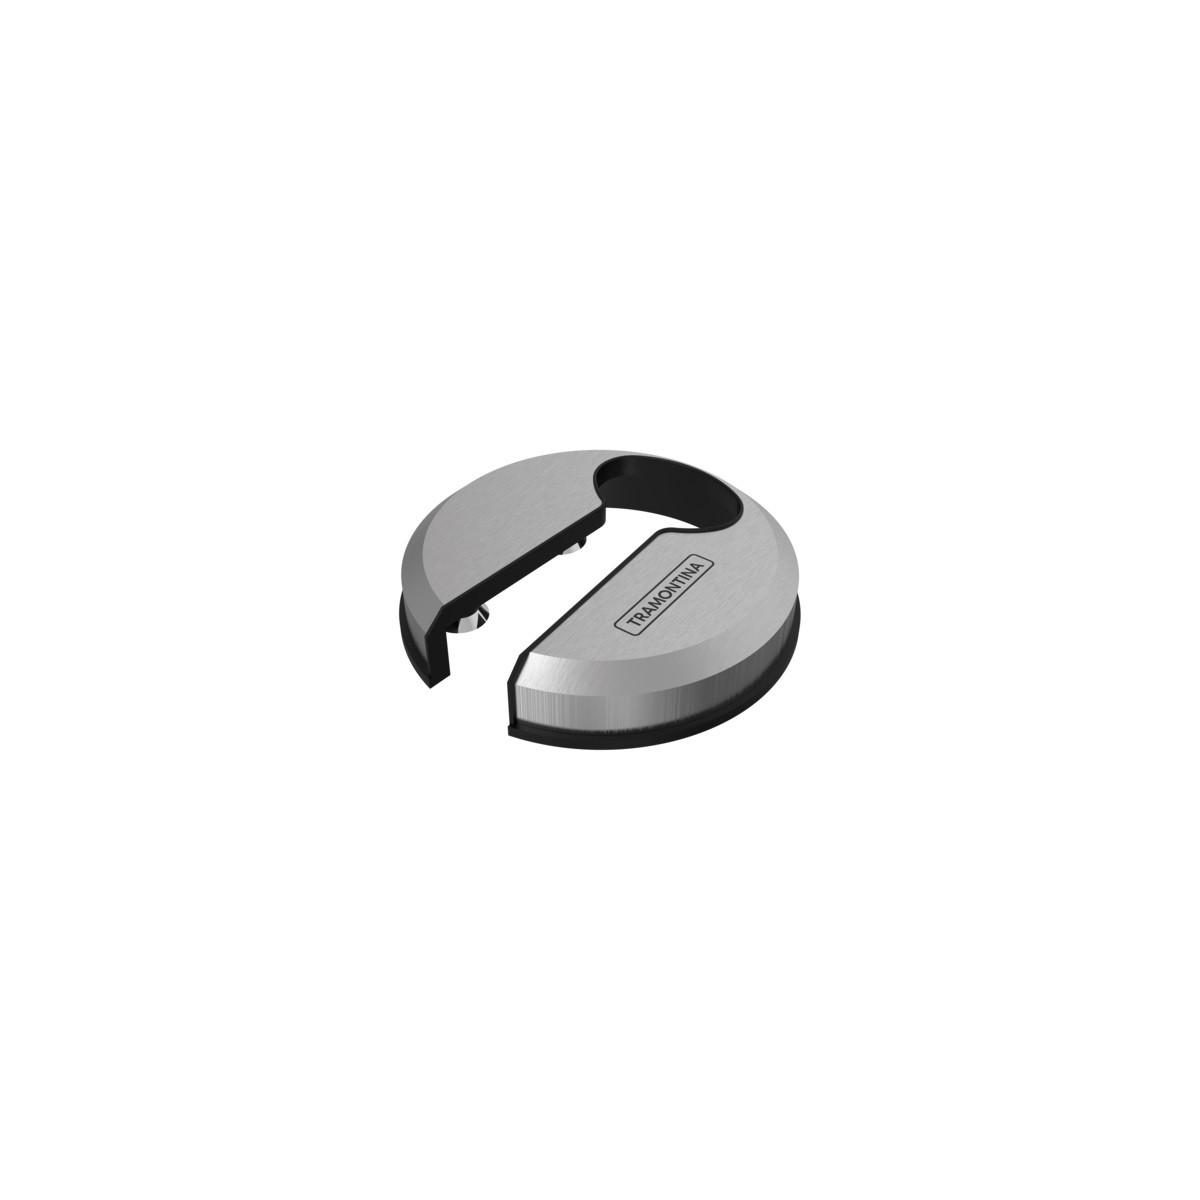 Corta Lacre Tramontina Harmoniza com Corpo em Aço Inox e Base em ABS  Tramontina 25553100